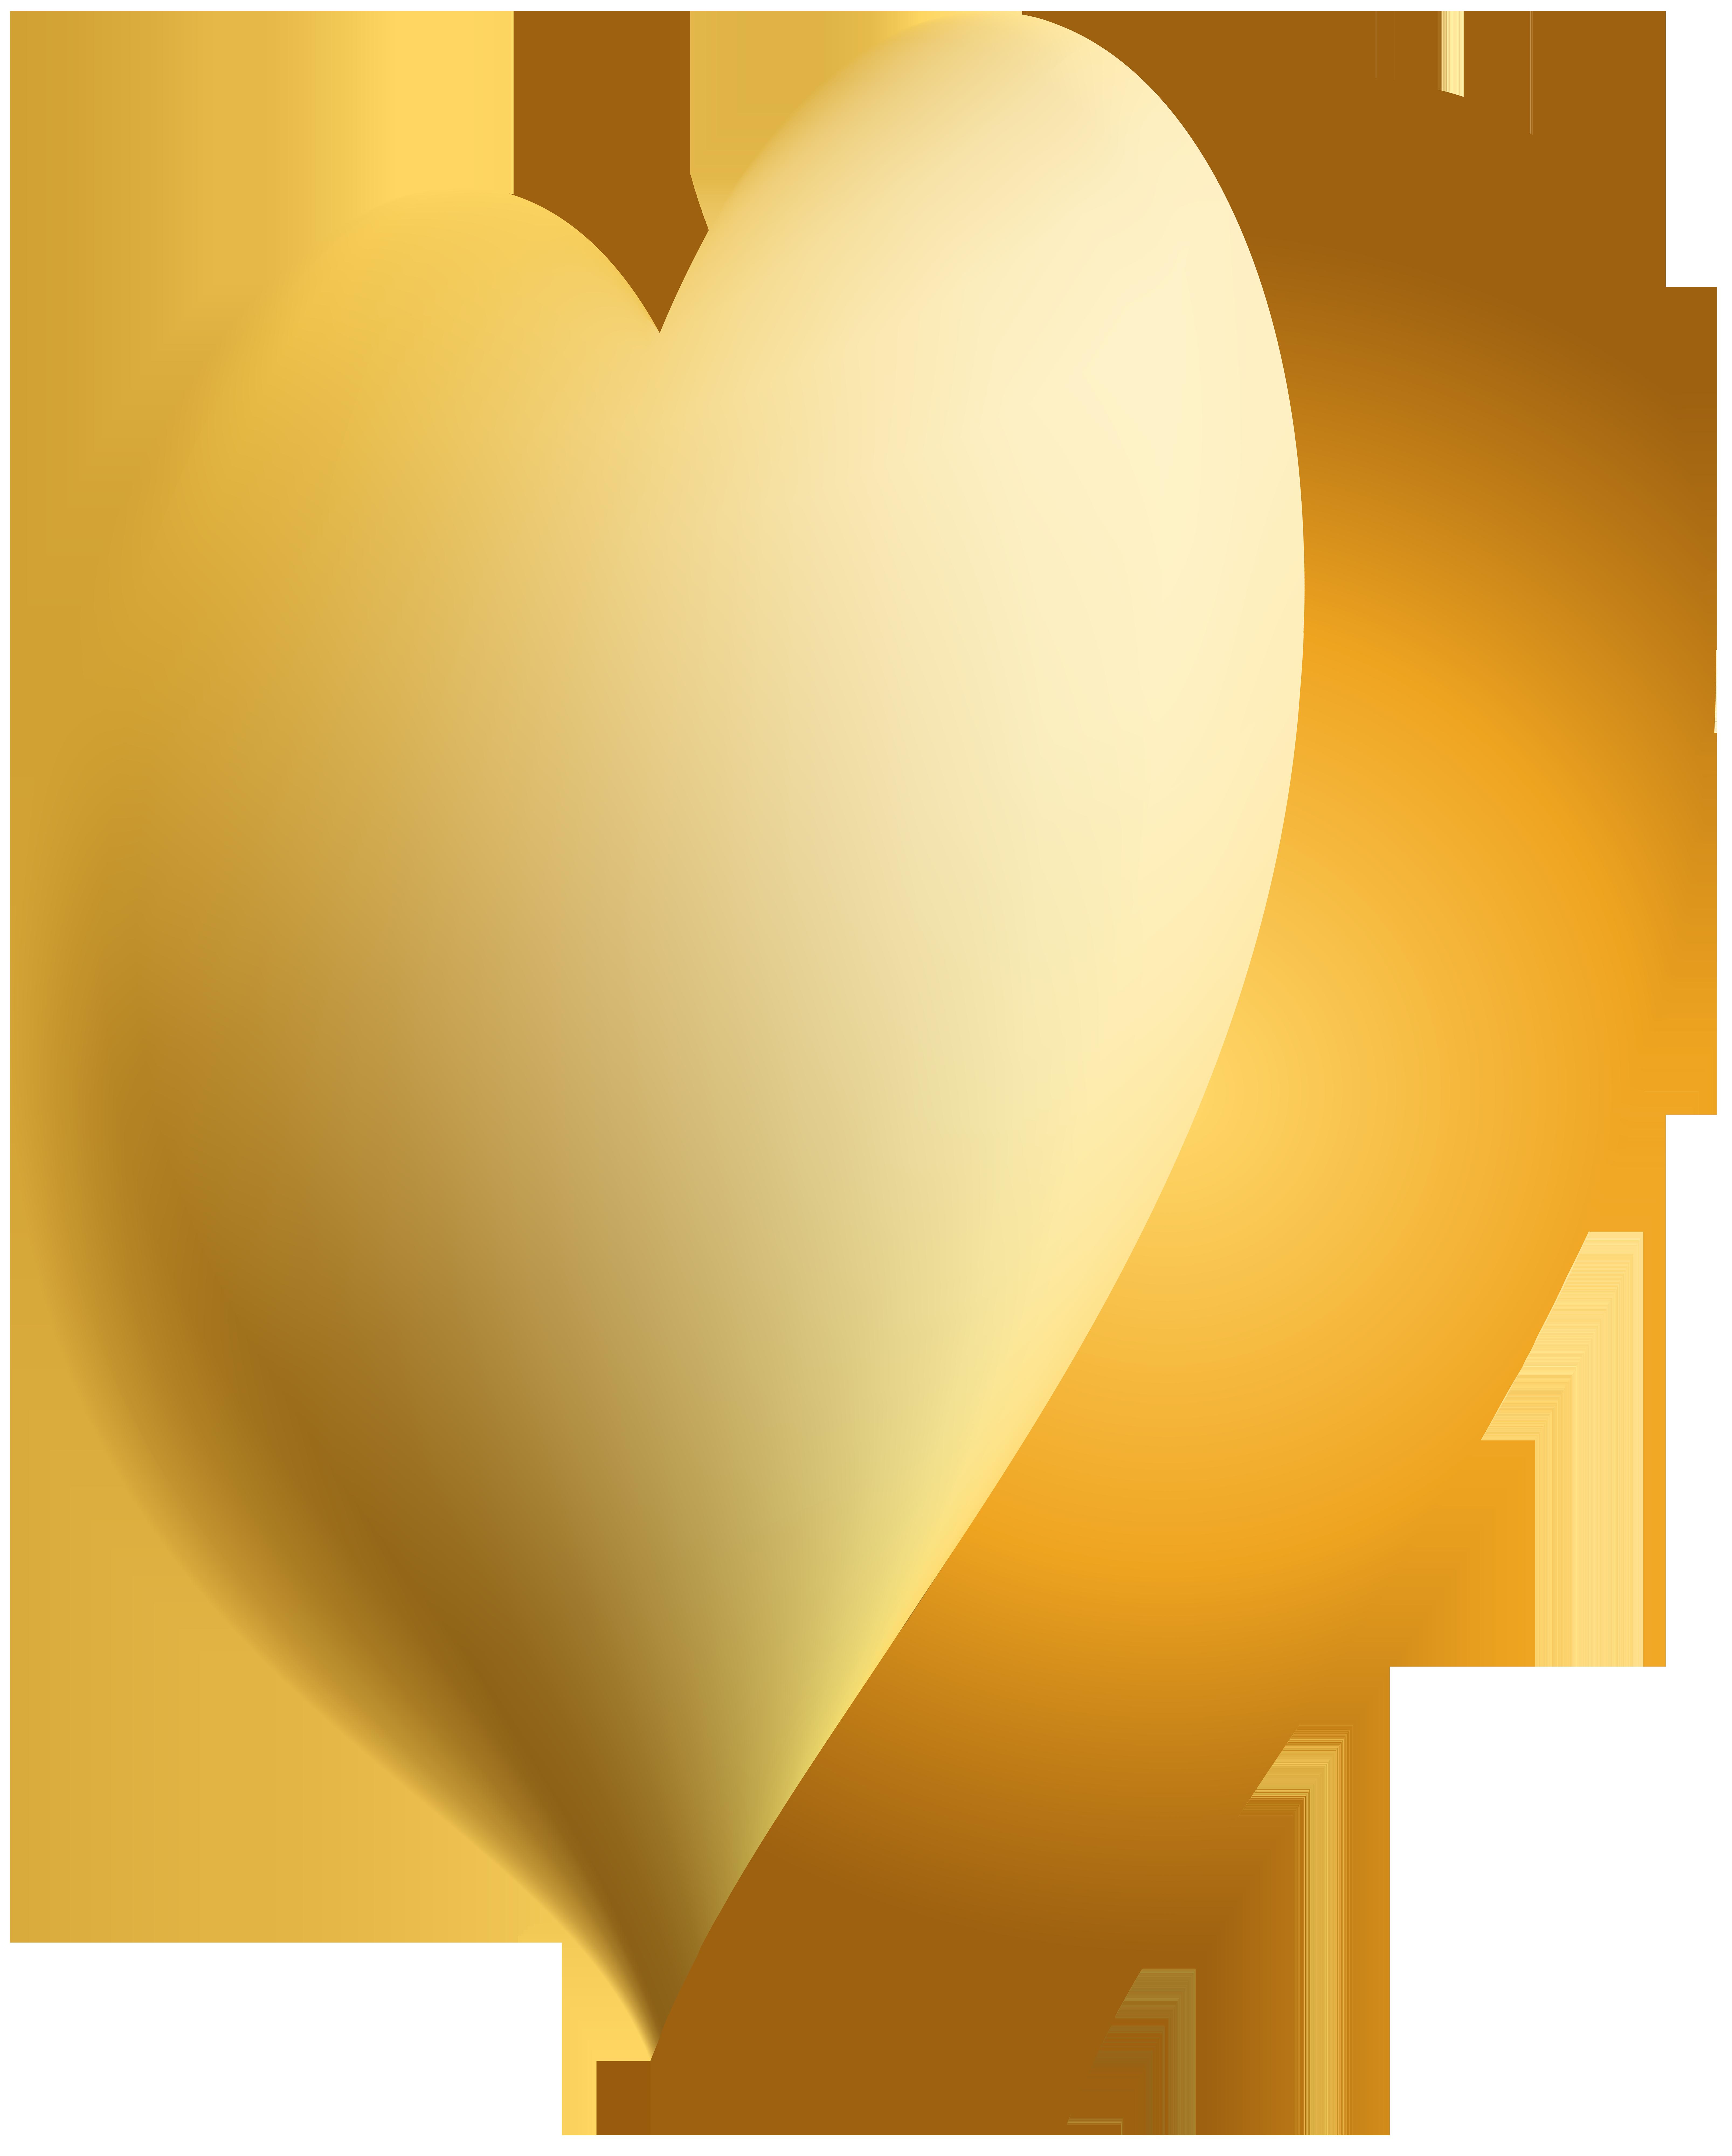 Clipart summer body. Gold heart transparent png